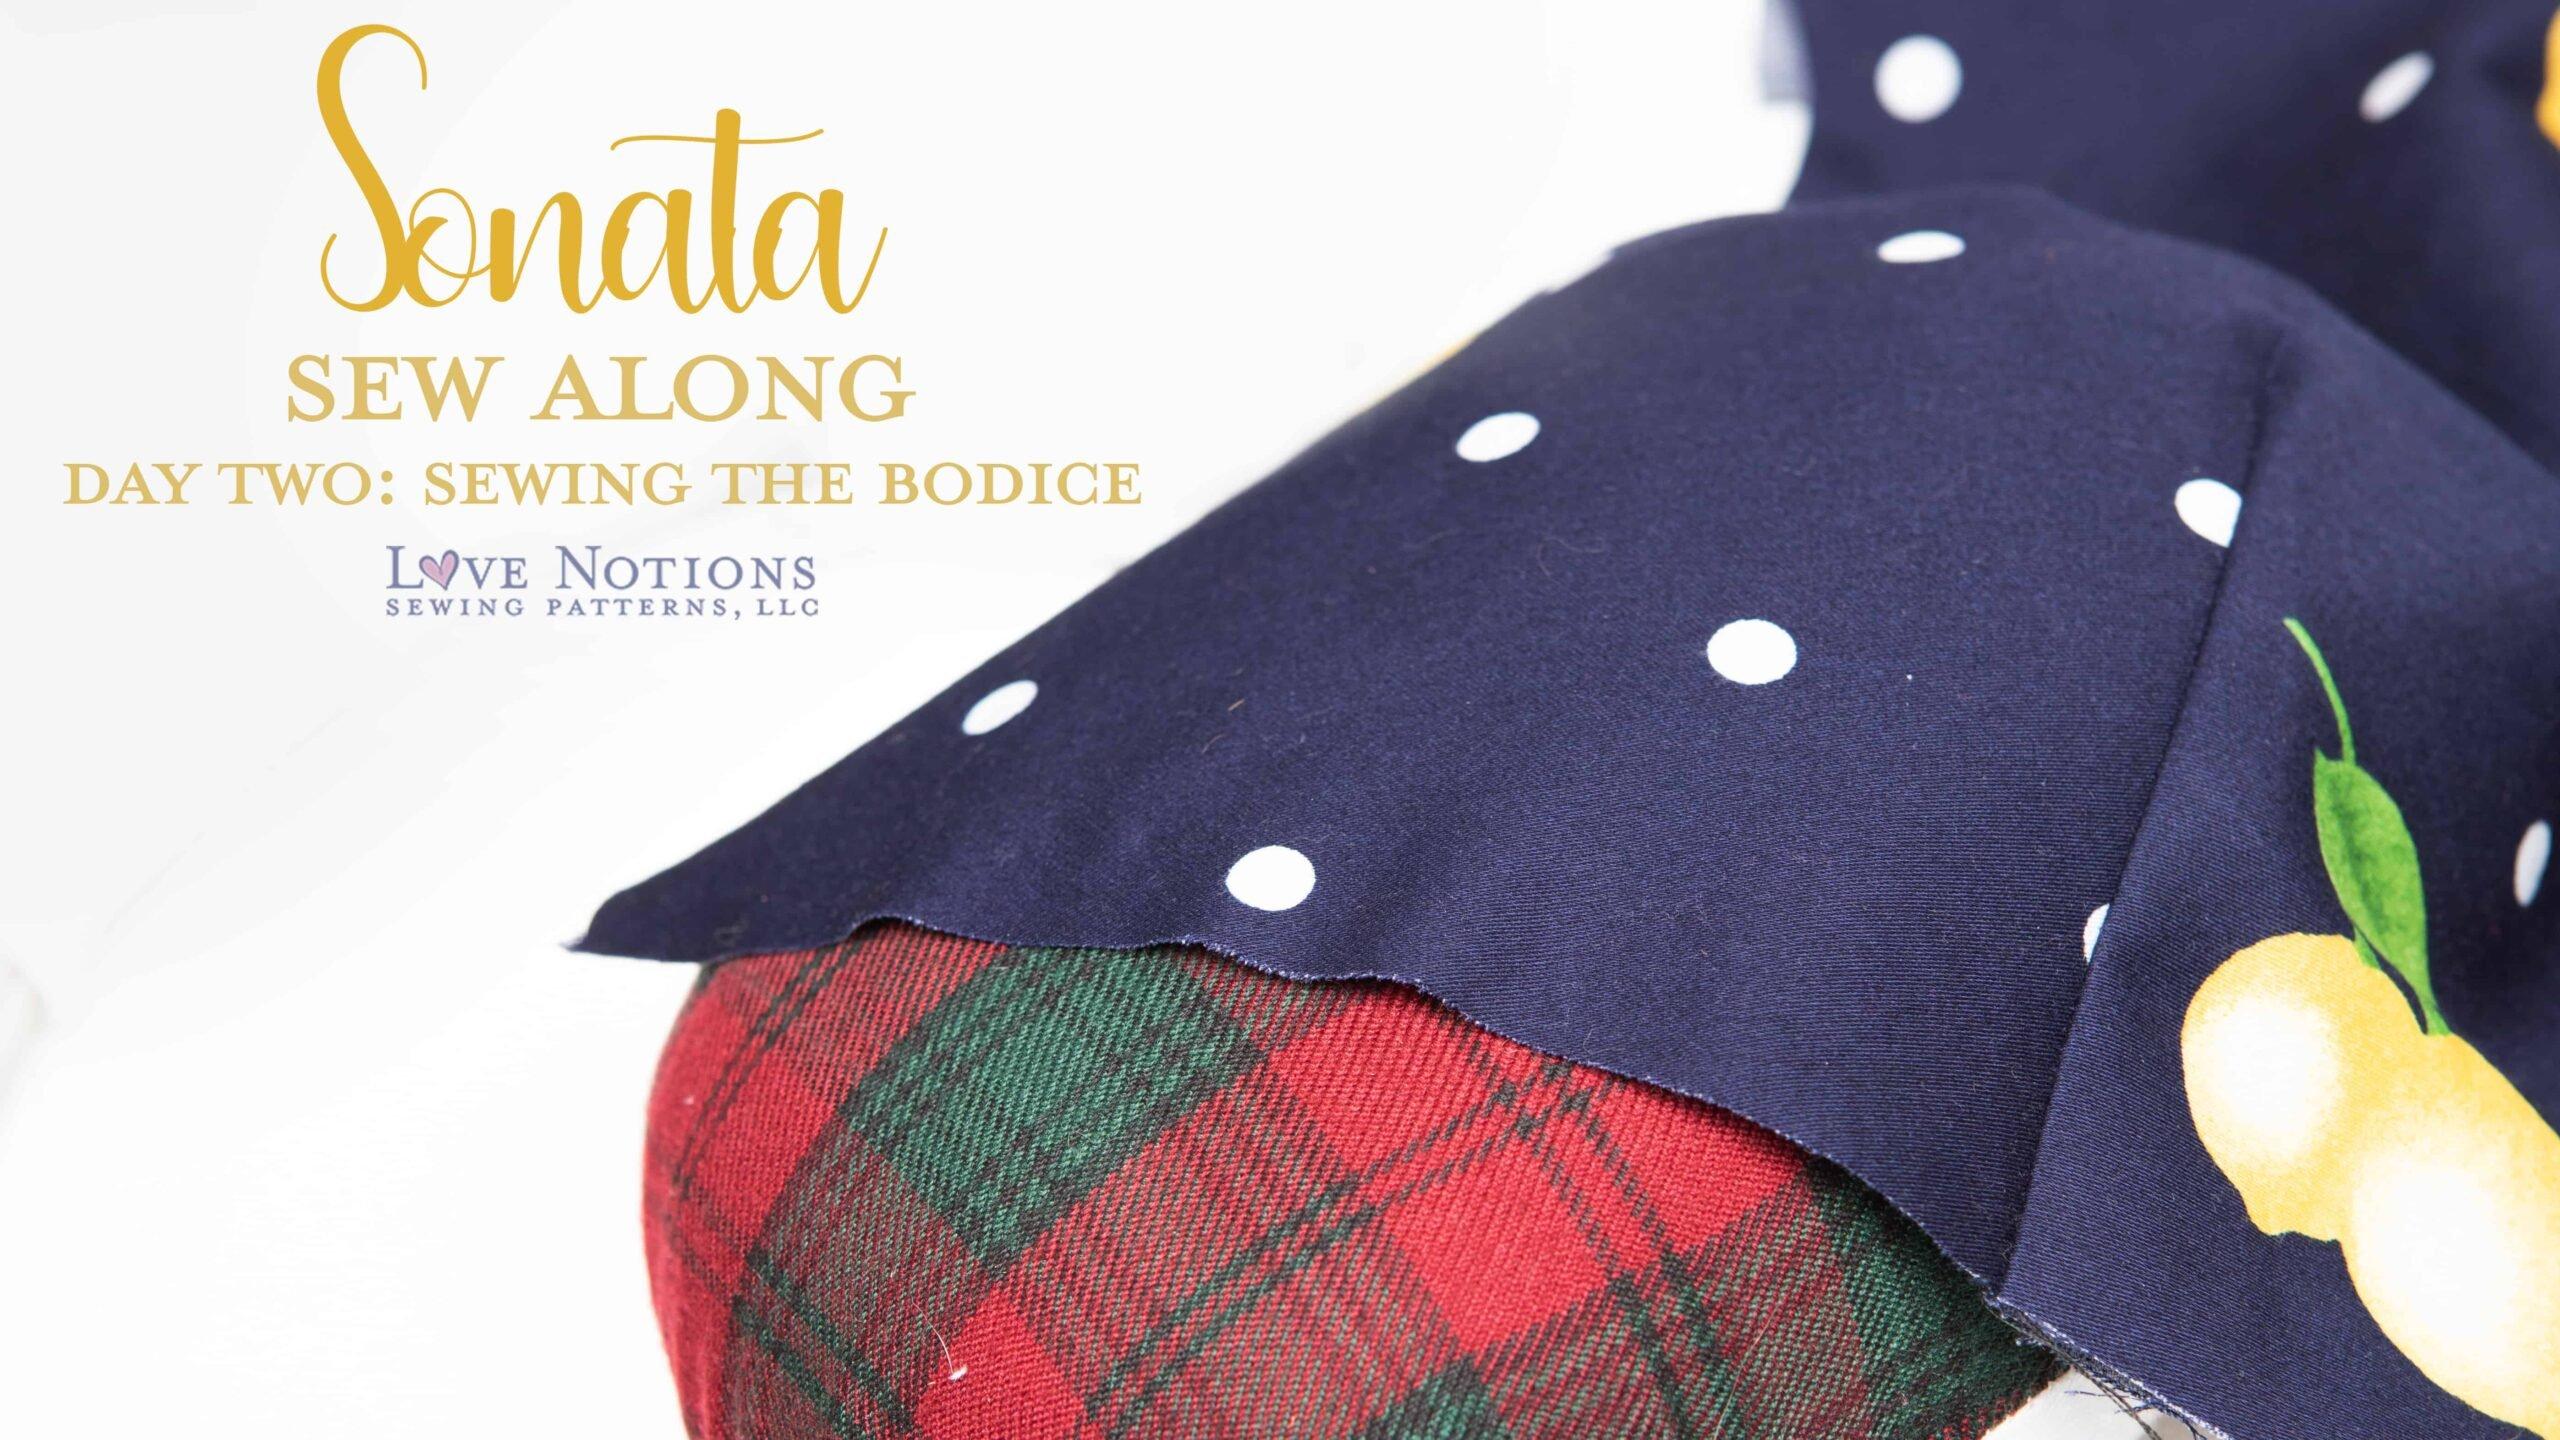 Sonata Sew Along Day Two